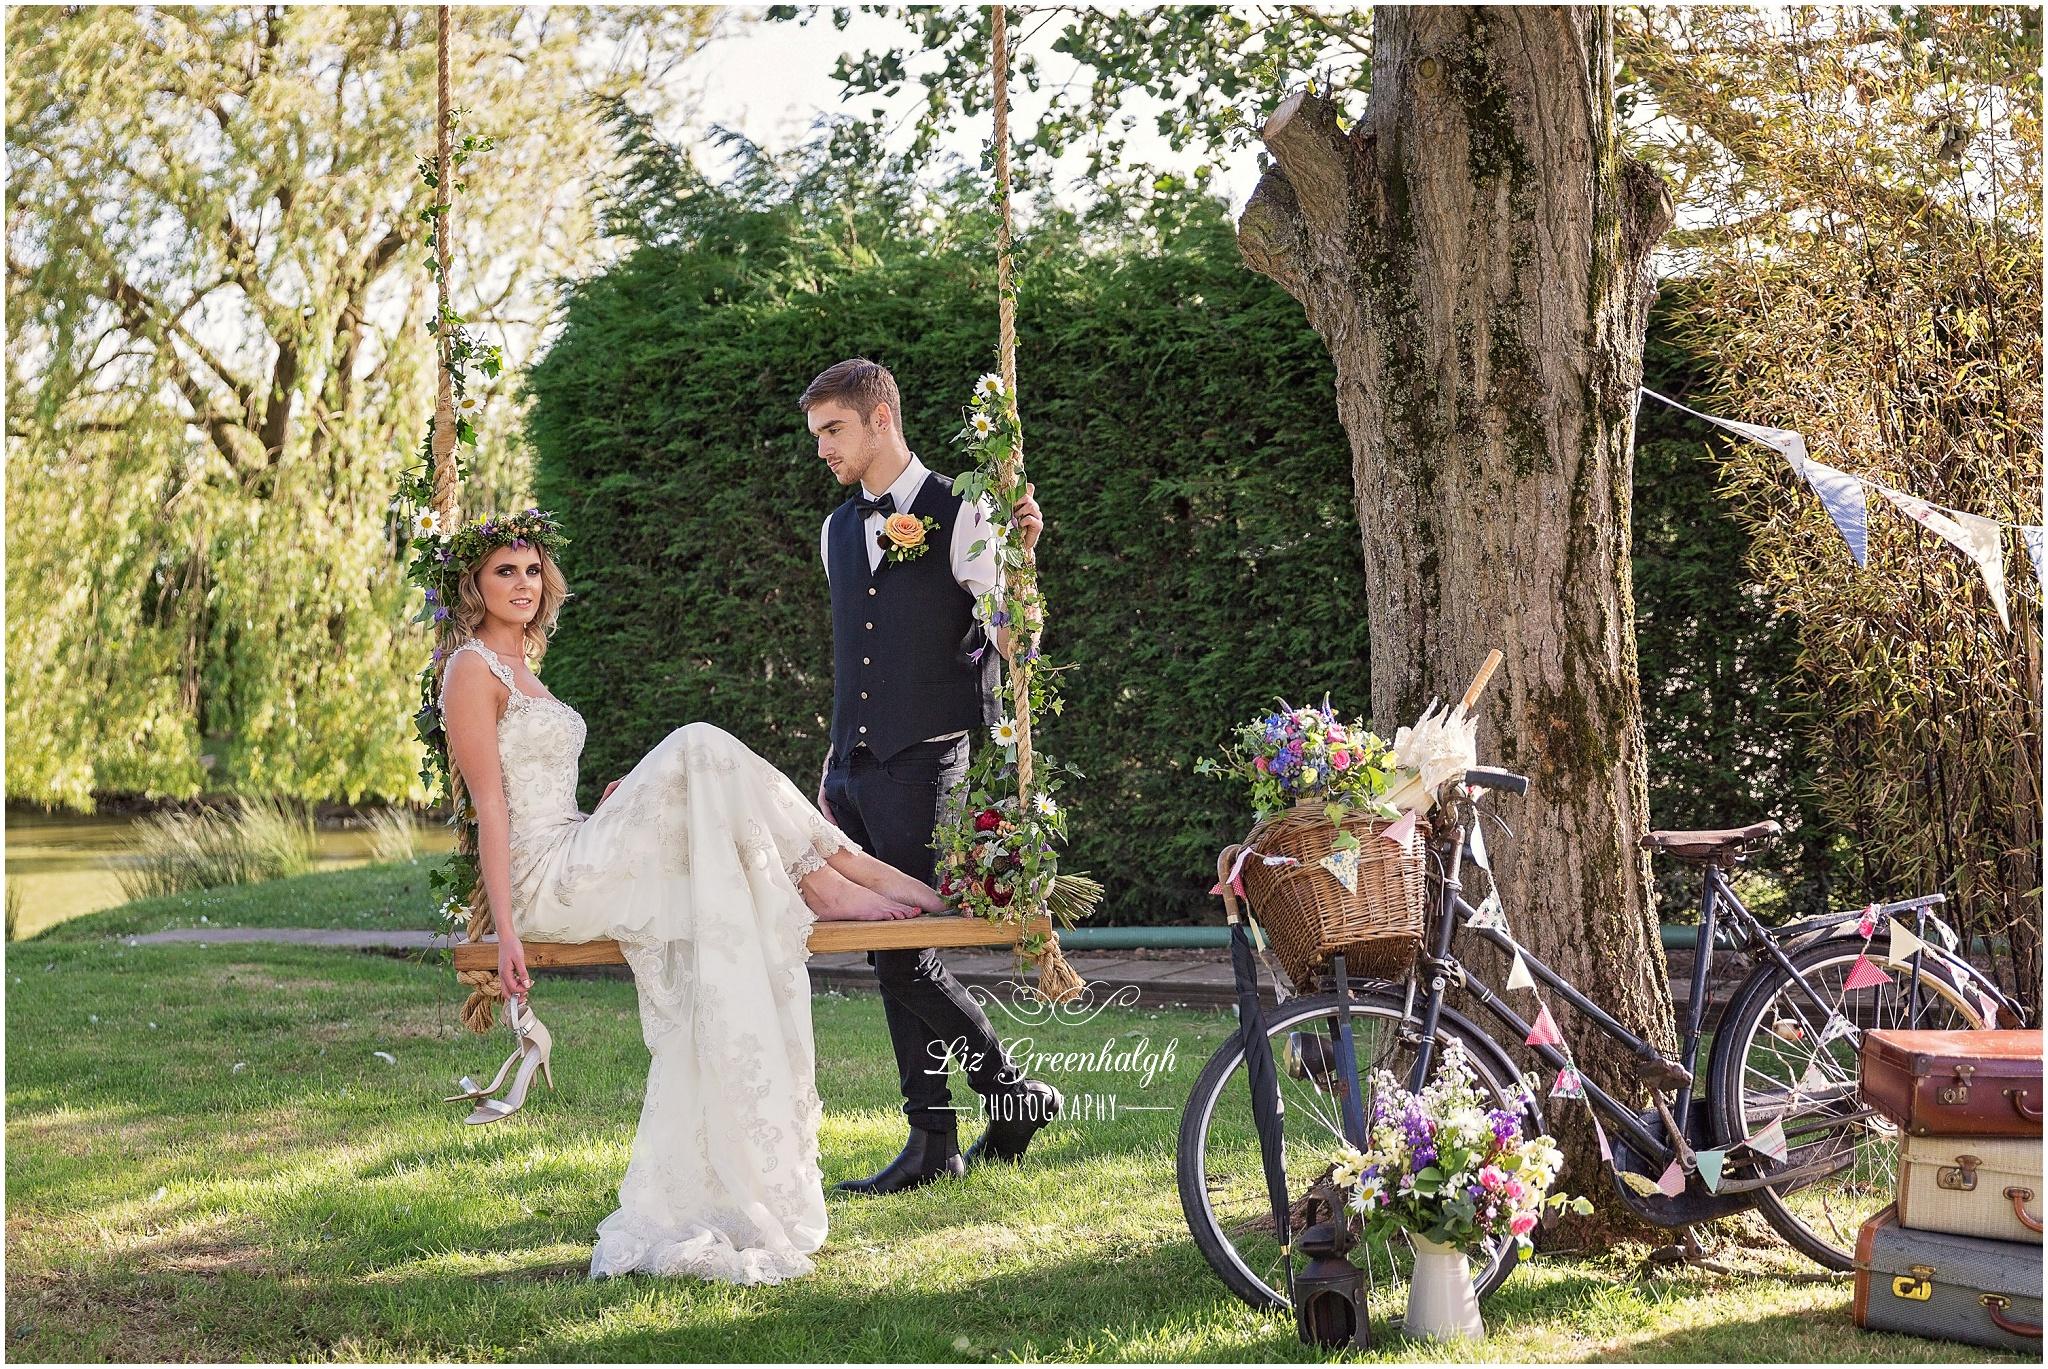 image 1 under vintage wedding hire.jpg